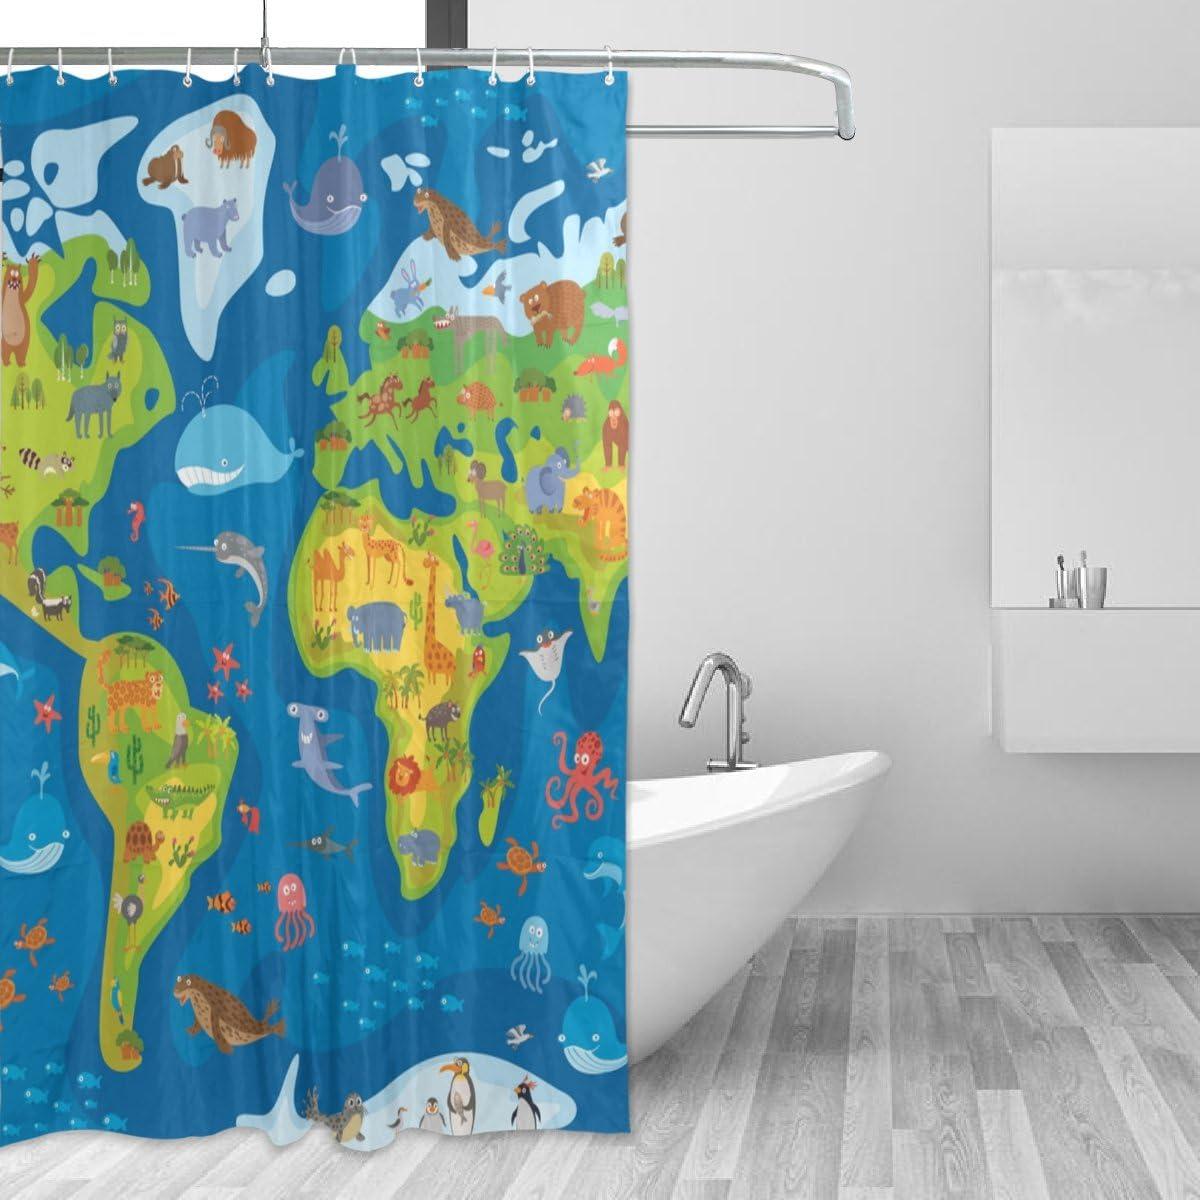 World Map Pattern Design Bathroom Polyester Shower Curtain Waterproof 12 Hooks